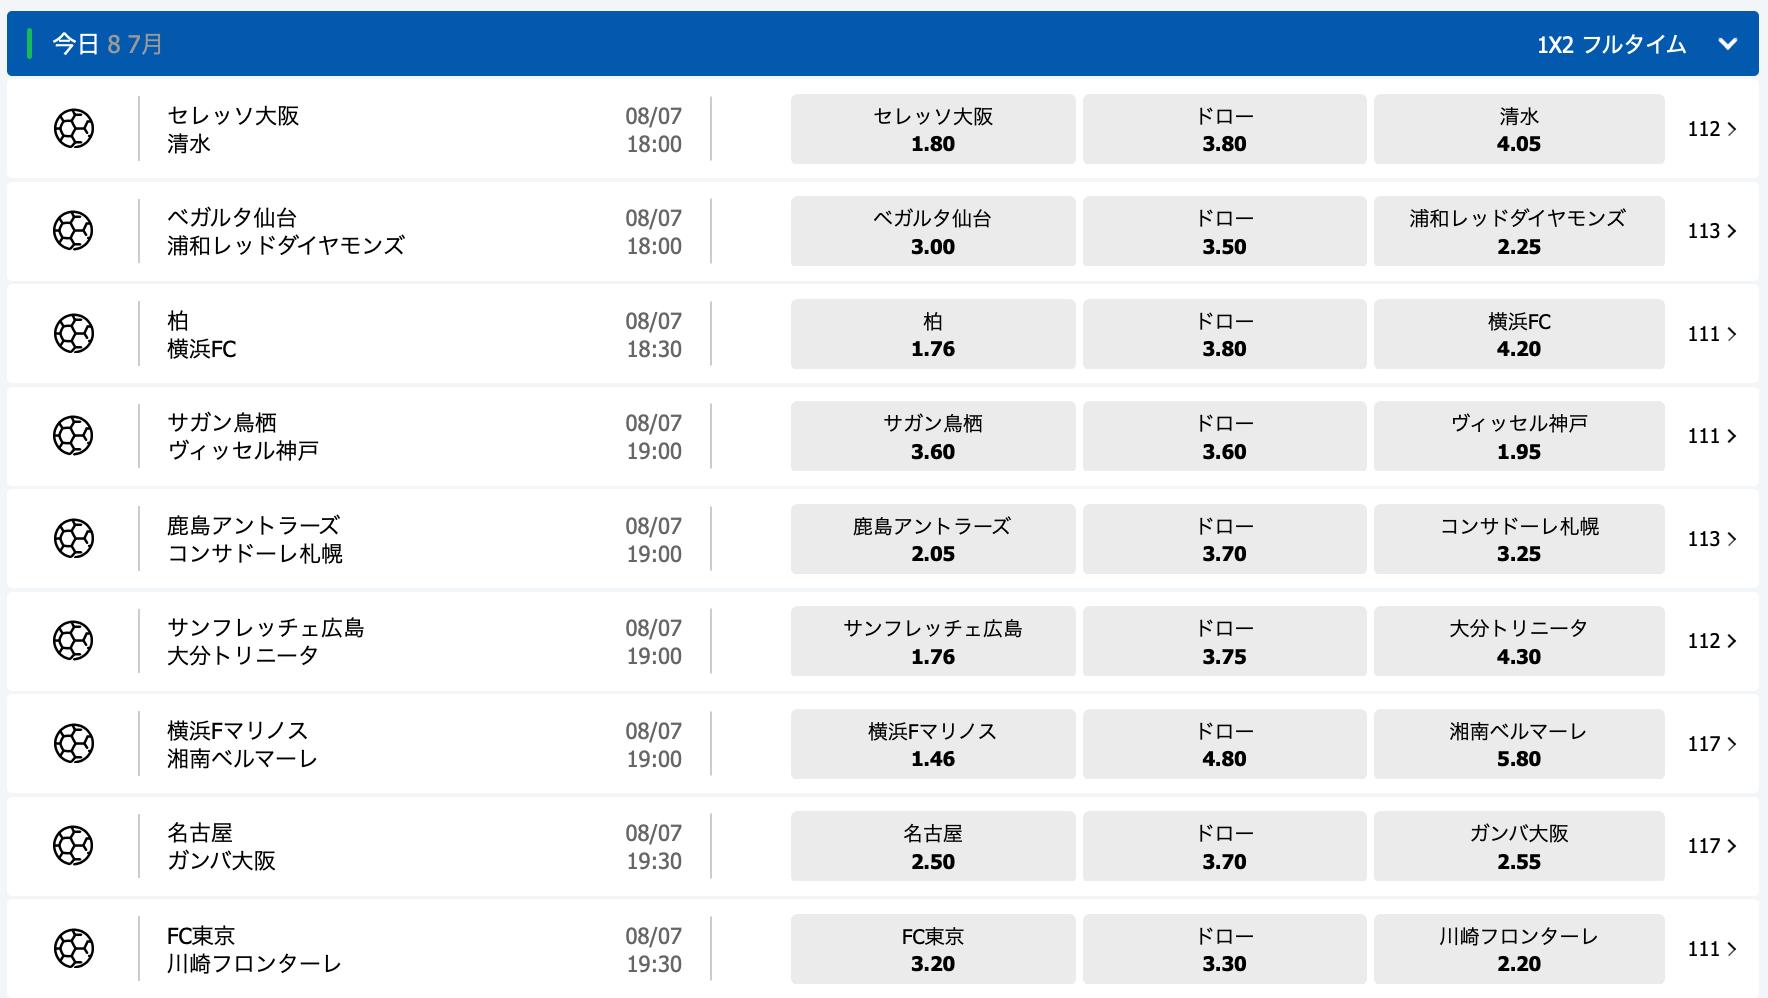 Jリーグ第3節・試合前予想オッズ評価